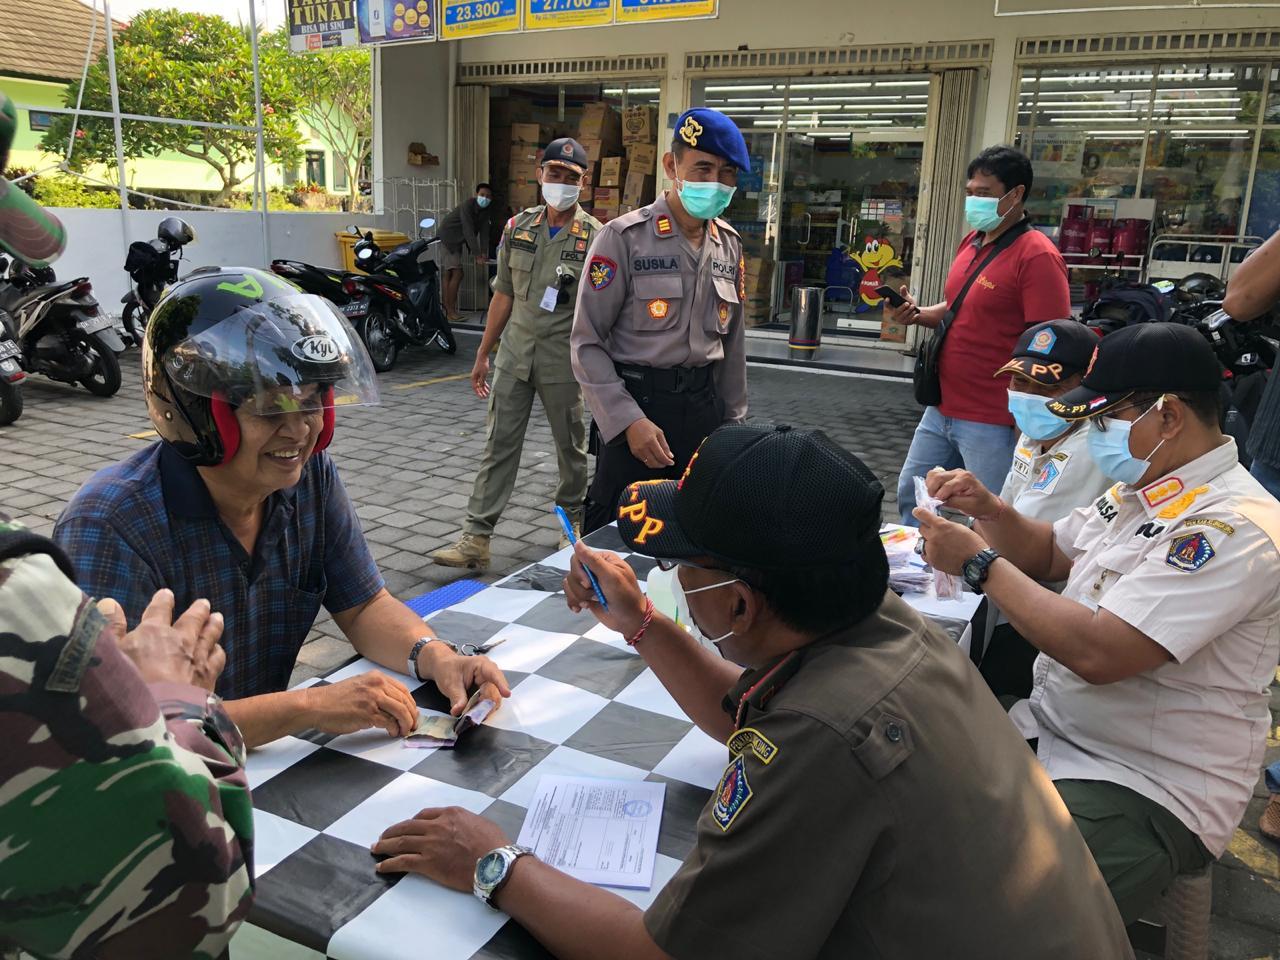 POLRES Klungkung bersama Satpol PP Klungkung menggelar Operasi Yustisi di Jalan Mada Klungkung, Kamis (3/12/2020). Foto: ist